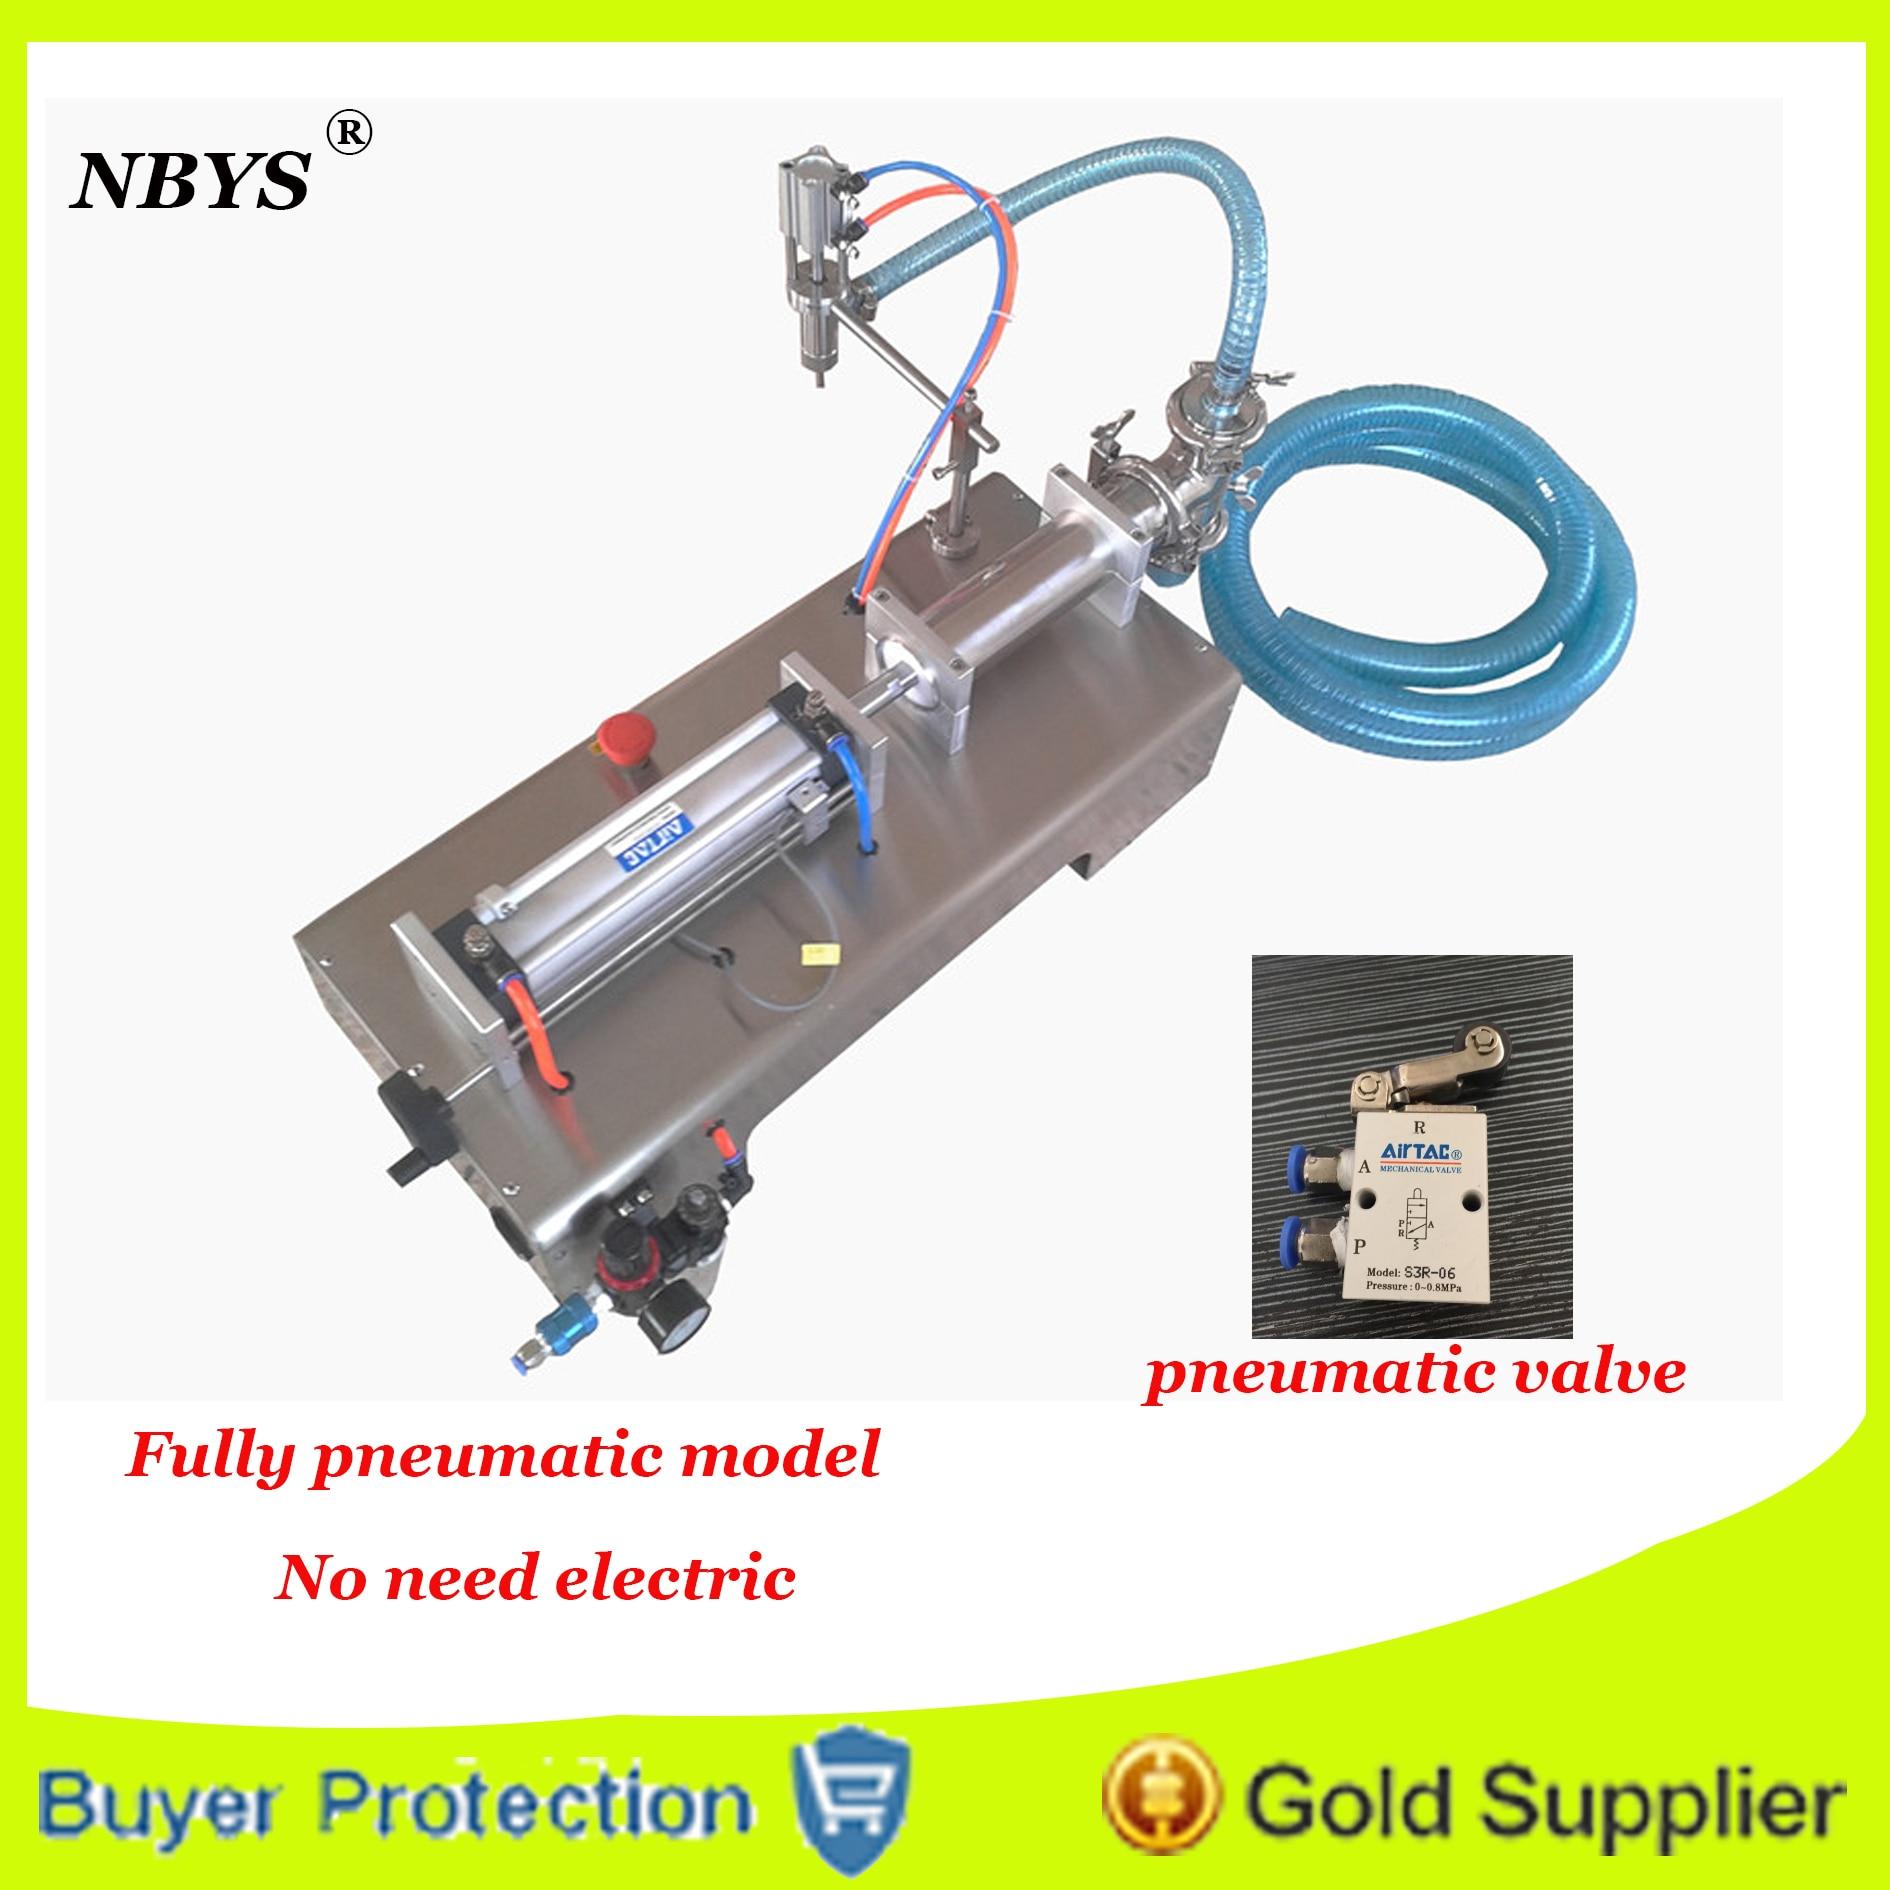 Free Shipping fully pneumatic filler liquid or paste filling machine, pneumatic, semi auto filler, single head liquid filler small bottle filling machine